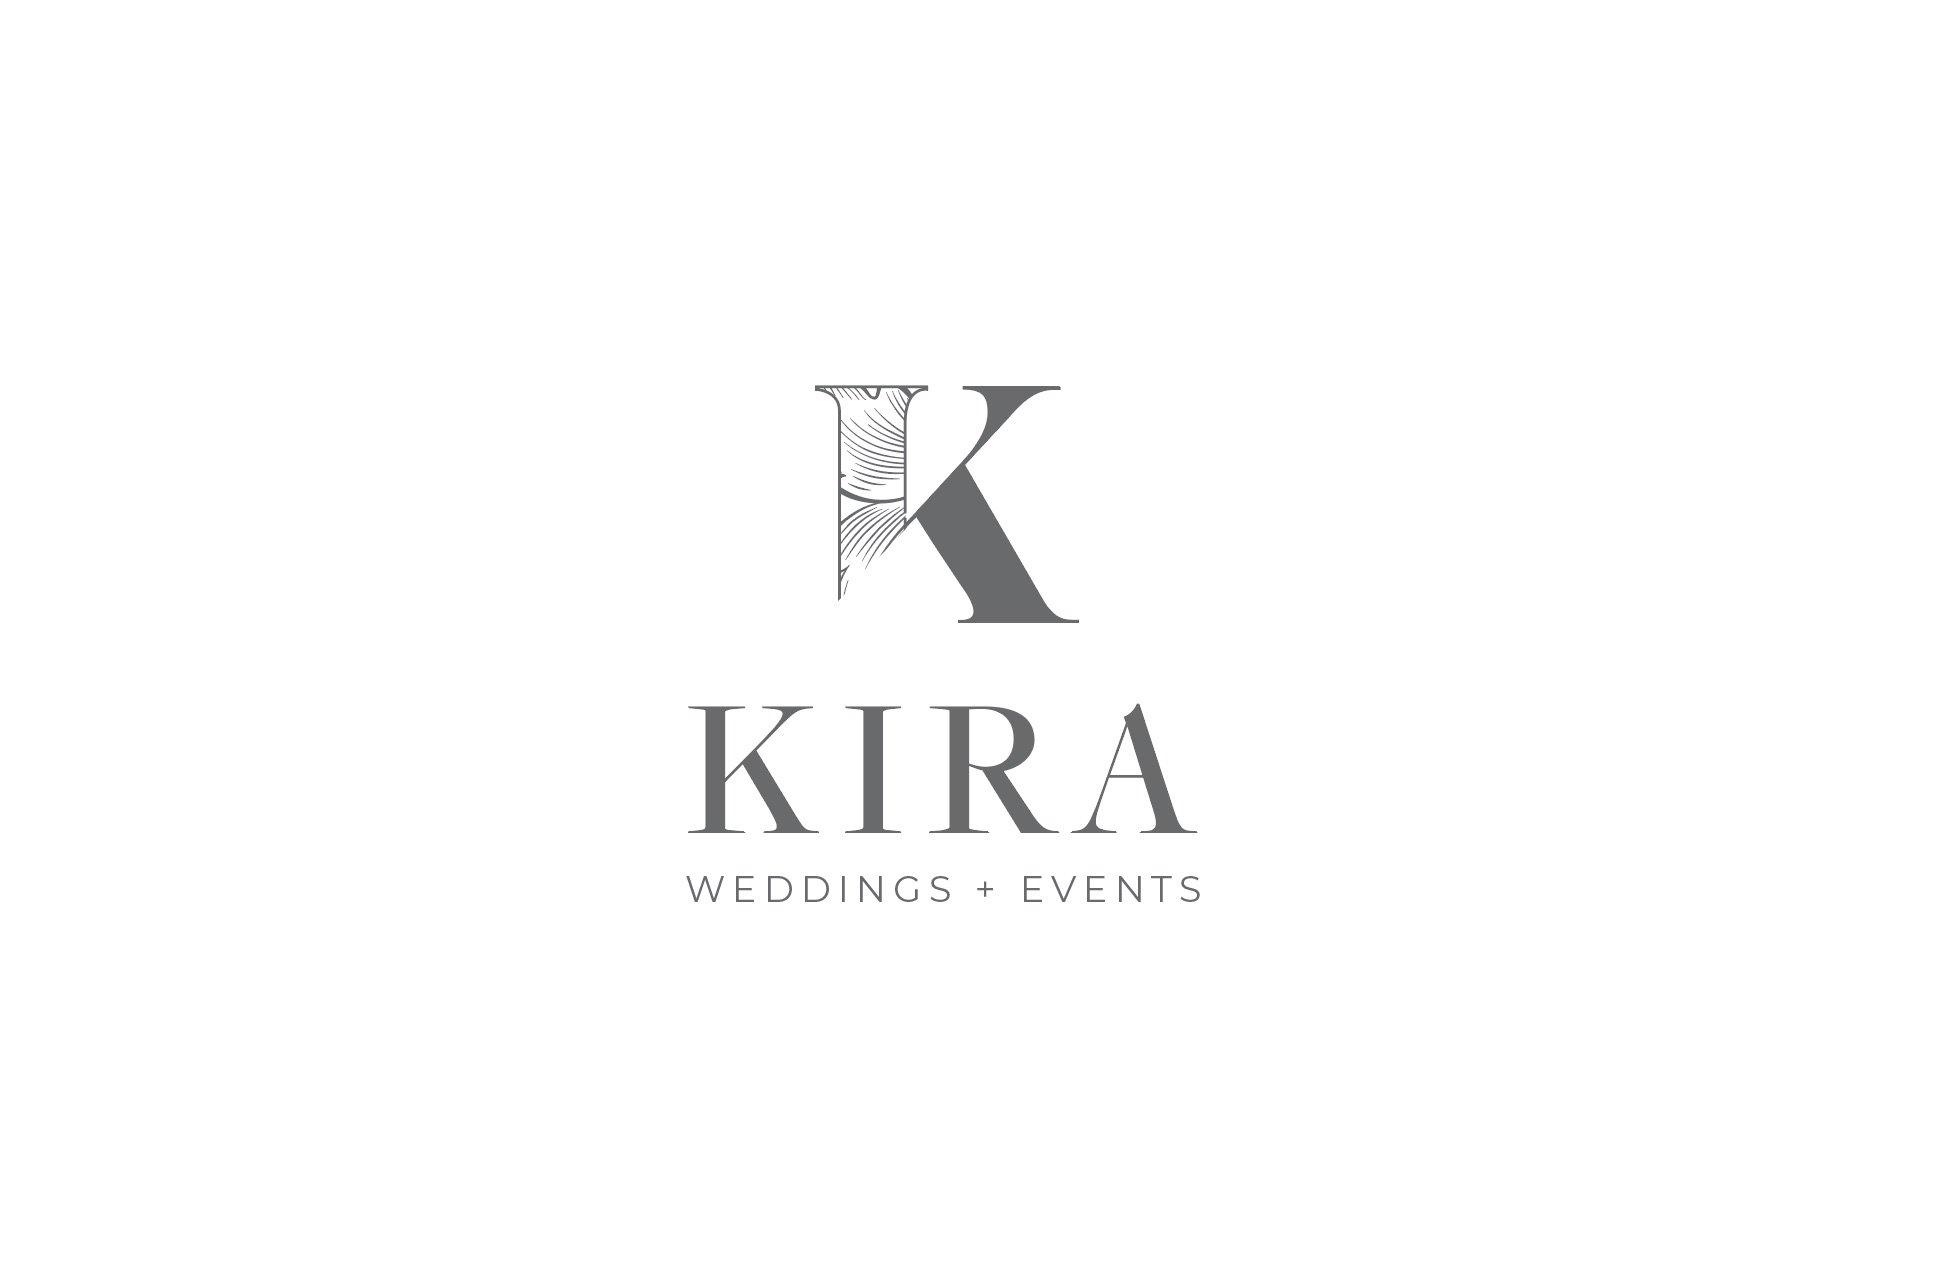 Kira Weddings & Events